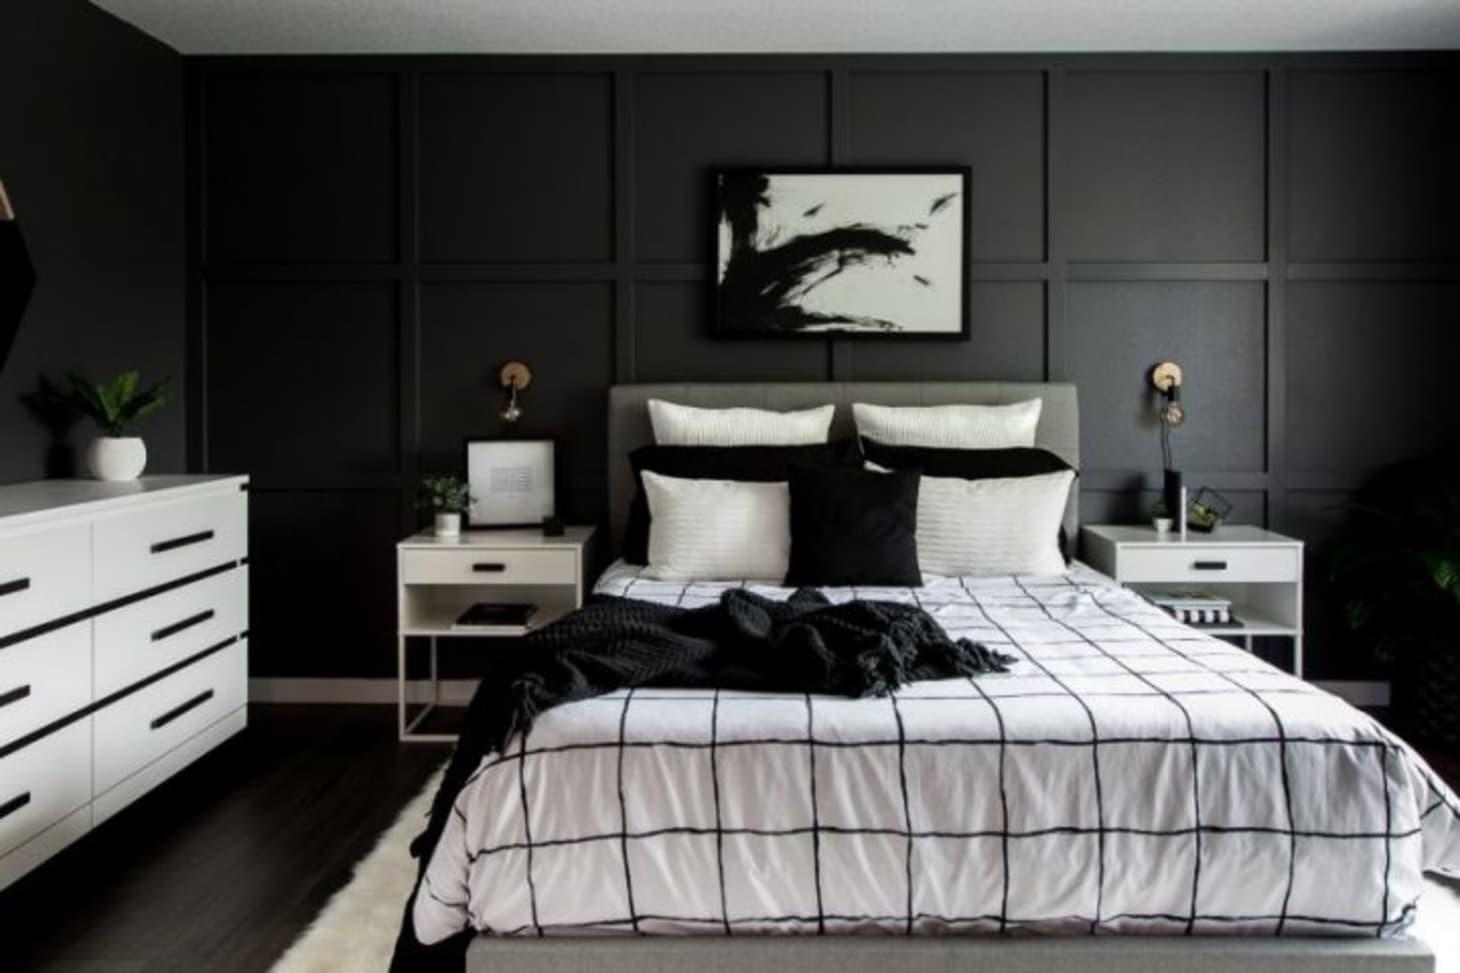 Beautiful Black Painted Rooms - Black Room Ideas | Apartment ...